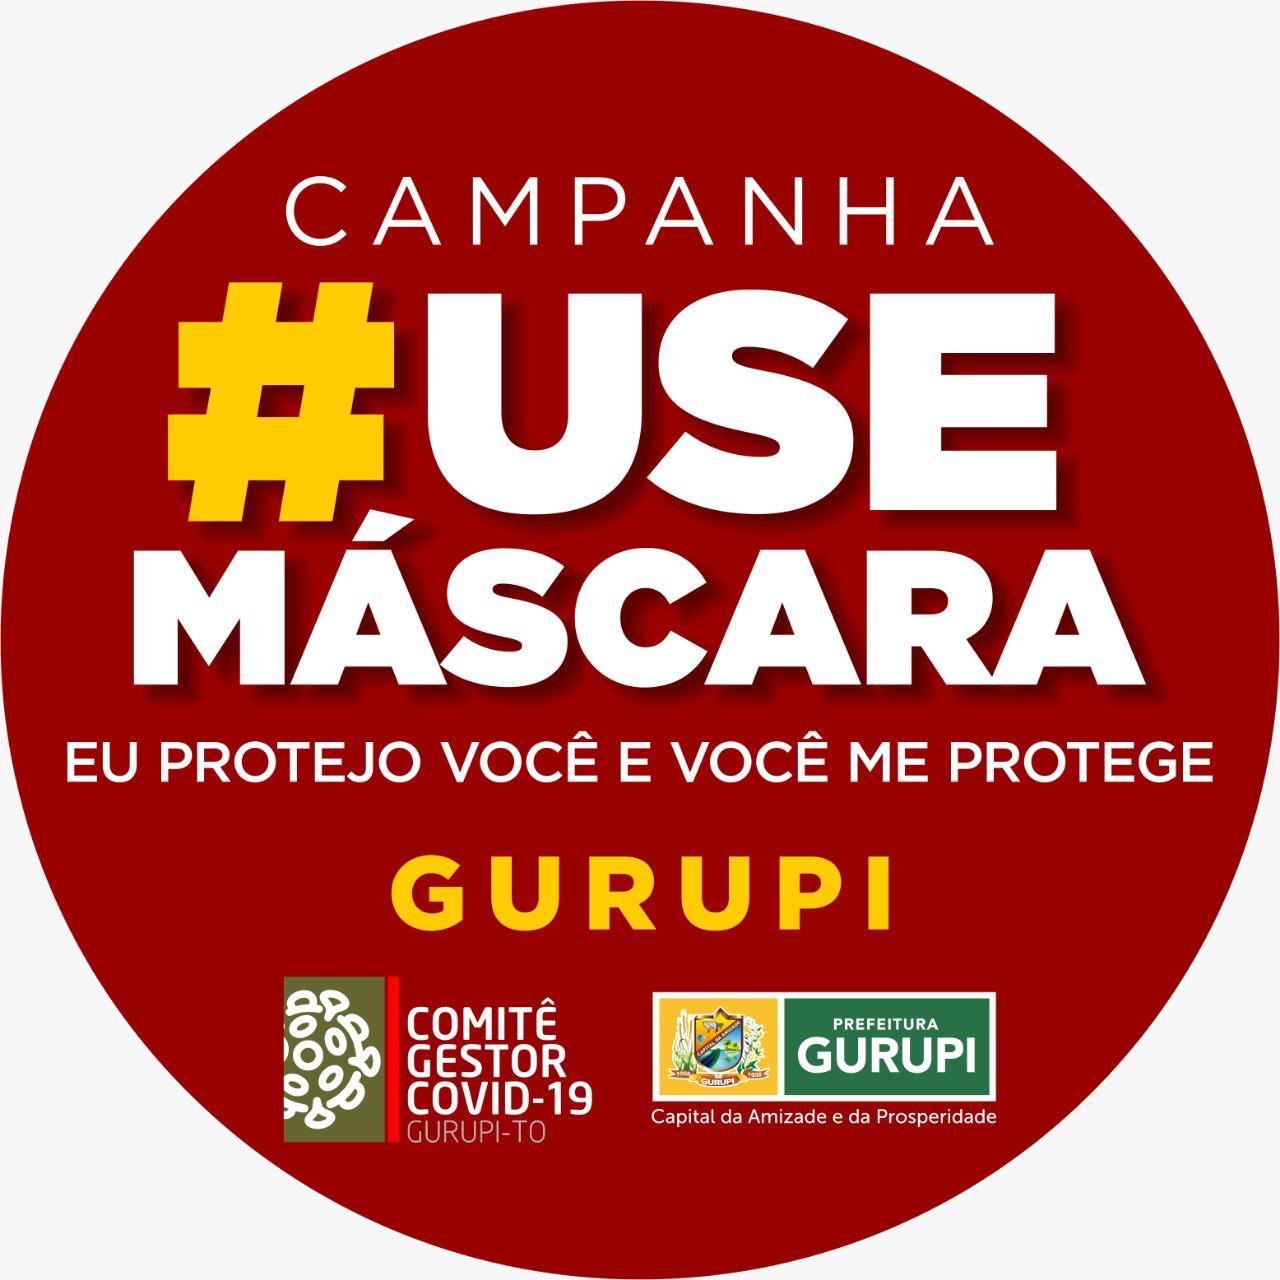 Prefeitura de Gurupi distribuirá 20 mil máscaras a cadastrados no CadÚnico